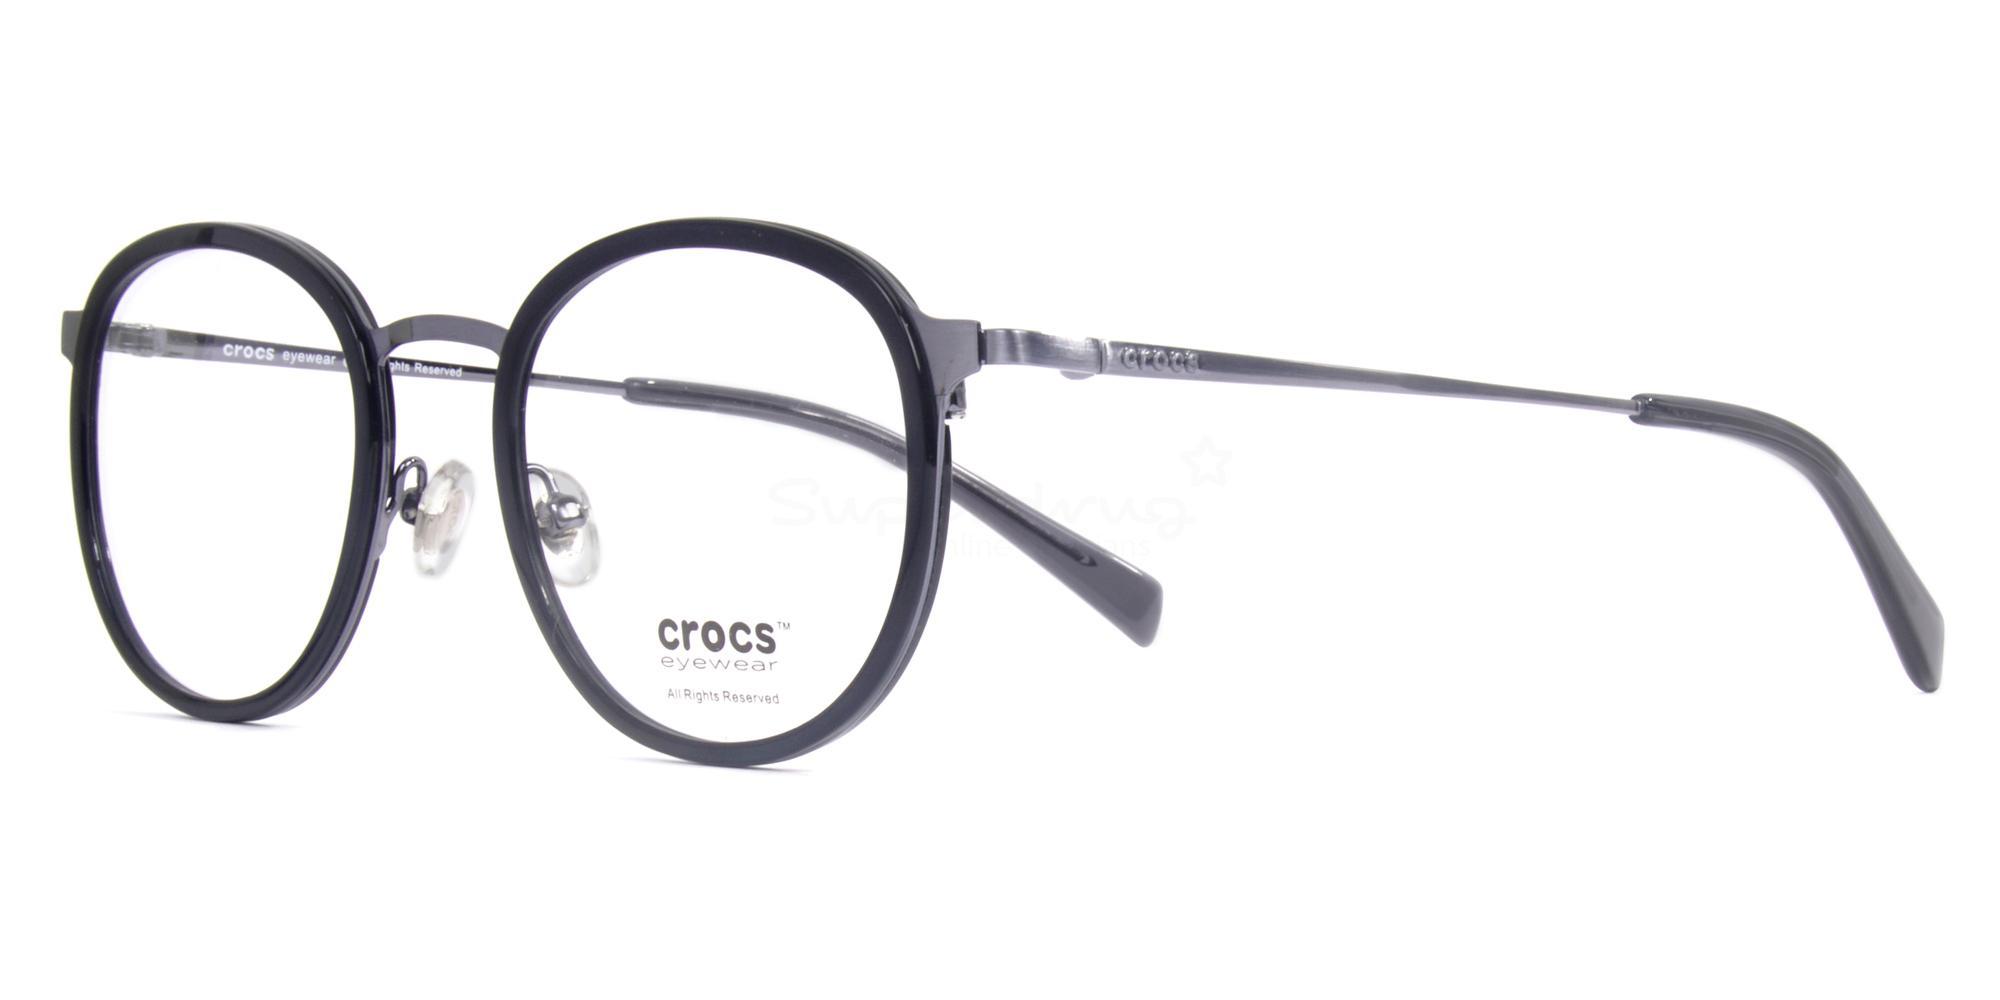 20GY CF4372 Glasses, Crocs Eyewear